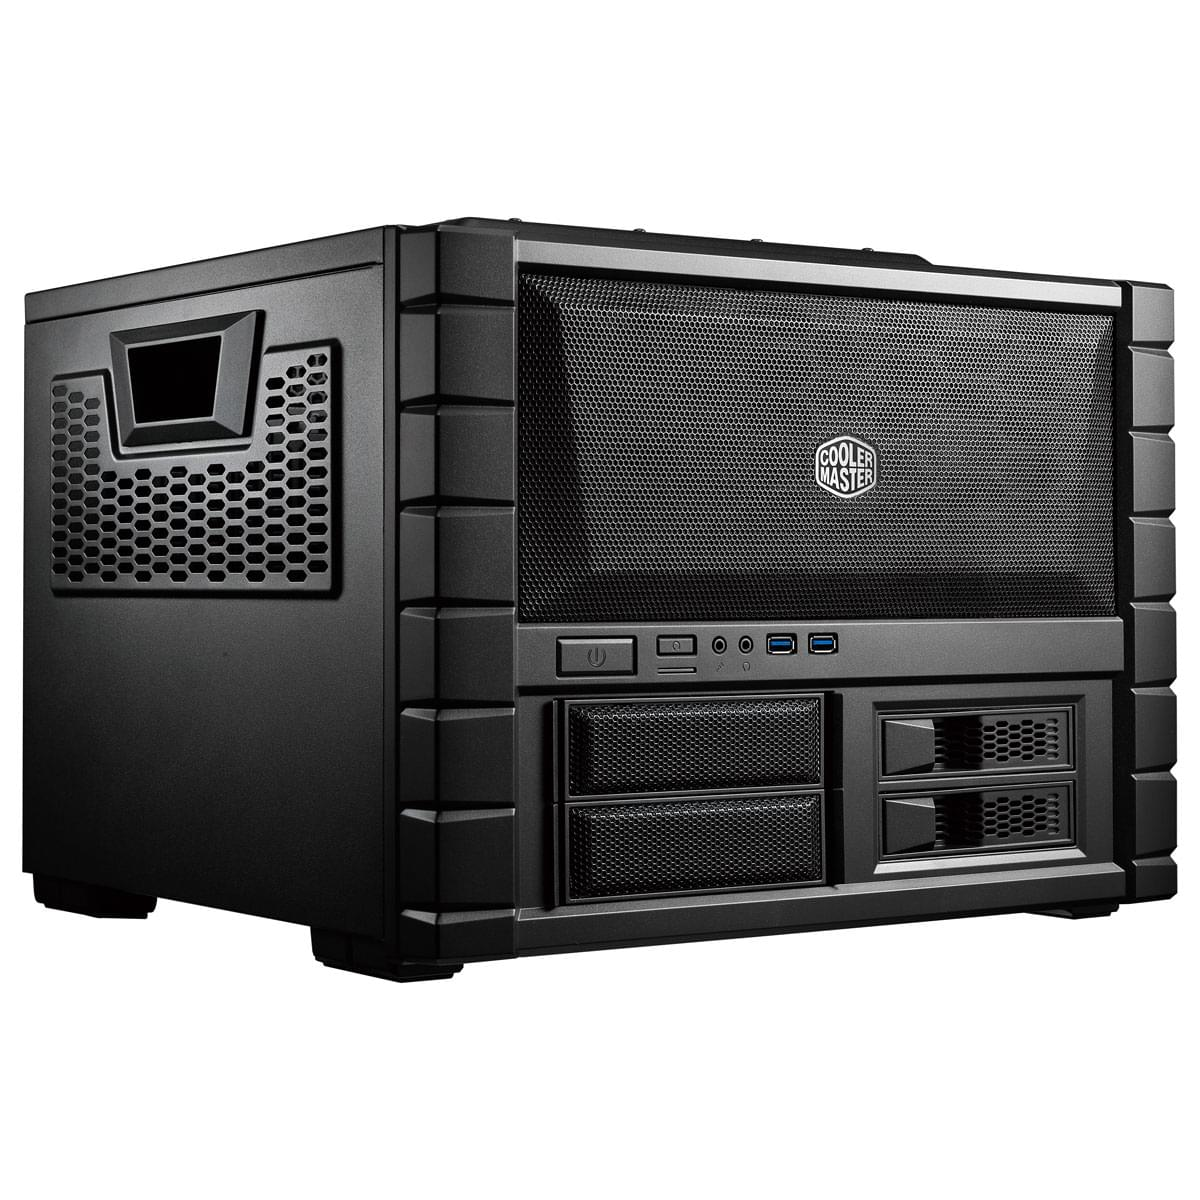 Cooler Master DT/Sans Alim/ATX Noir - Boîtier PC Cooler Master - 0